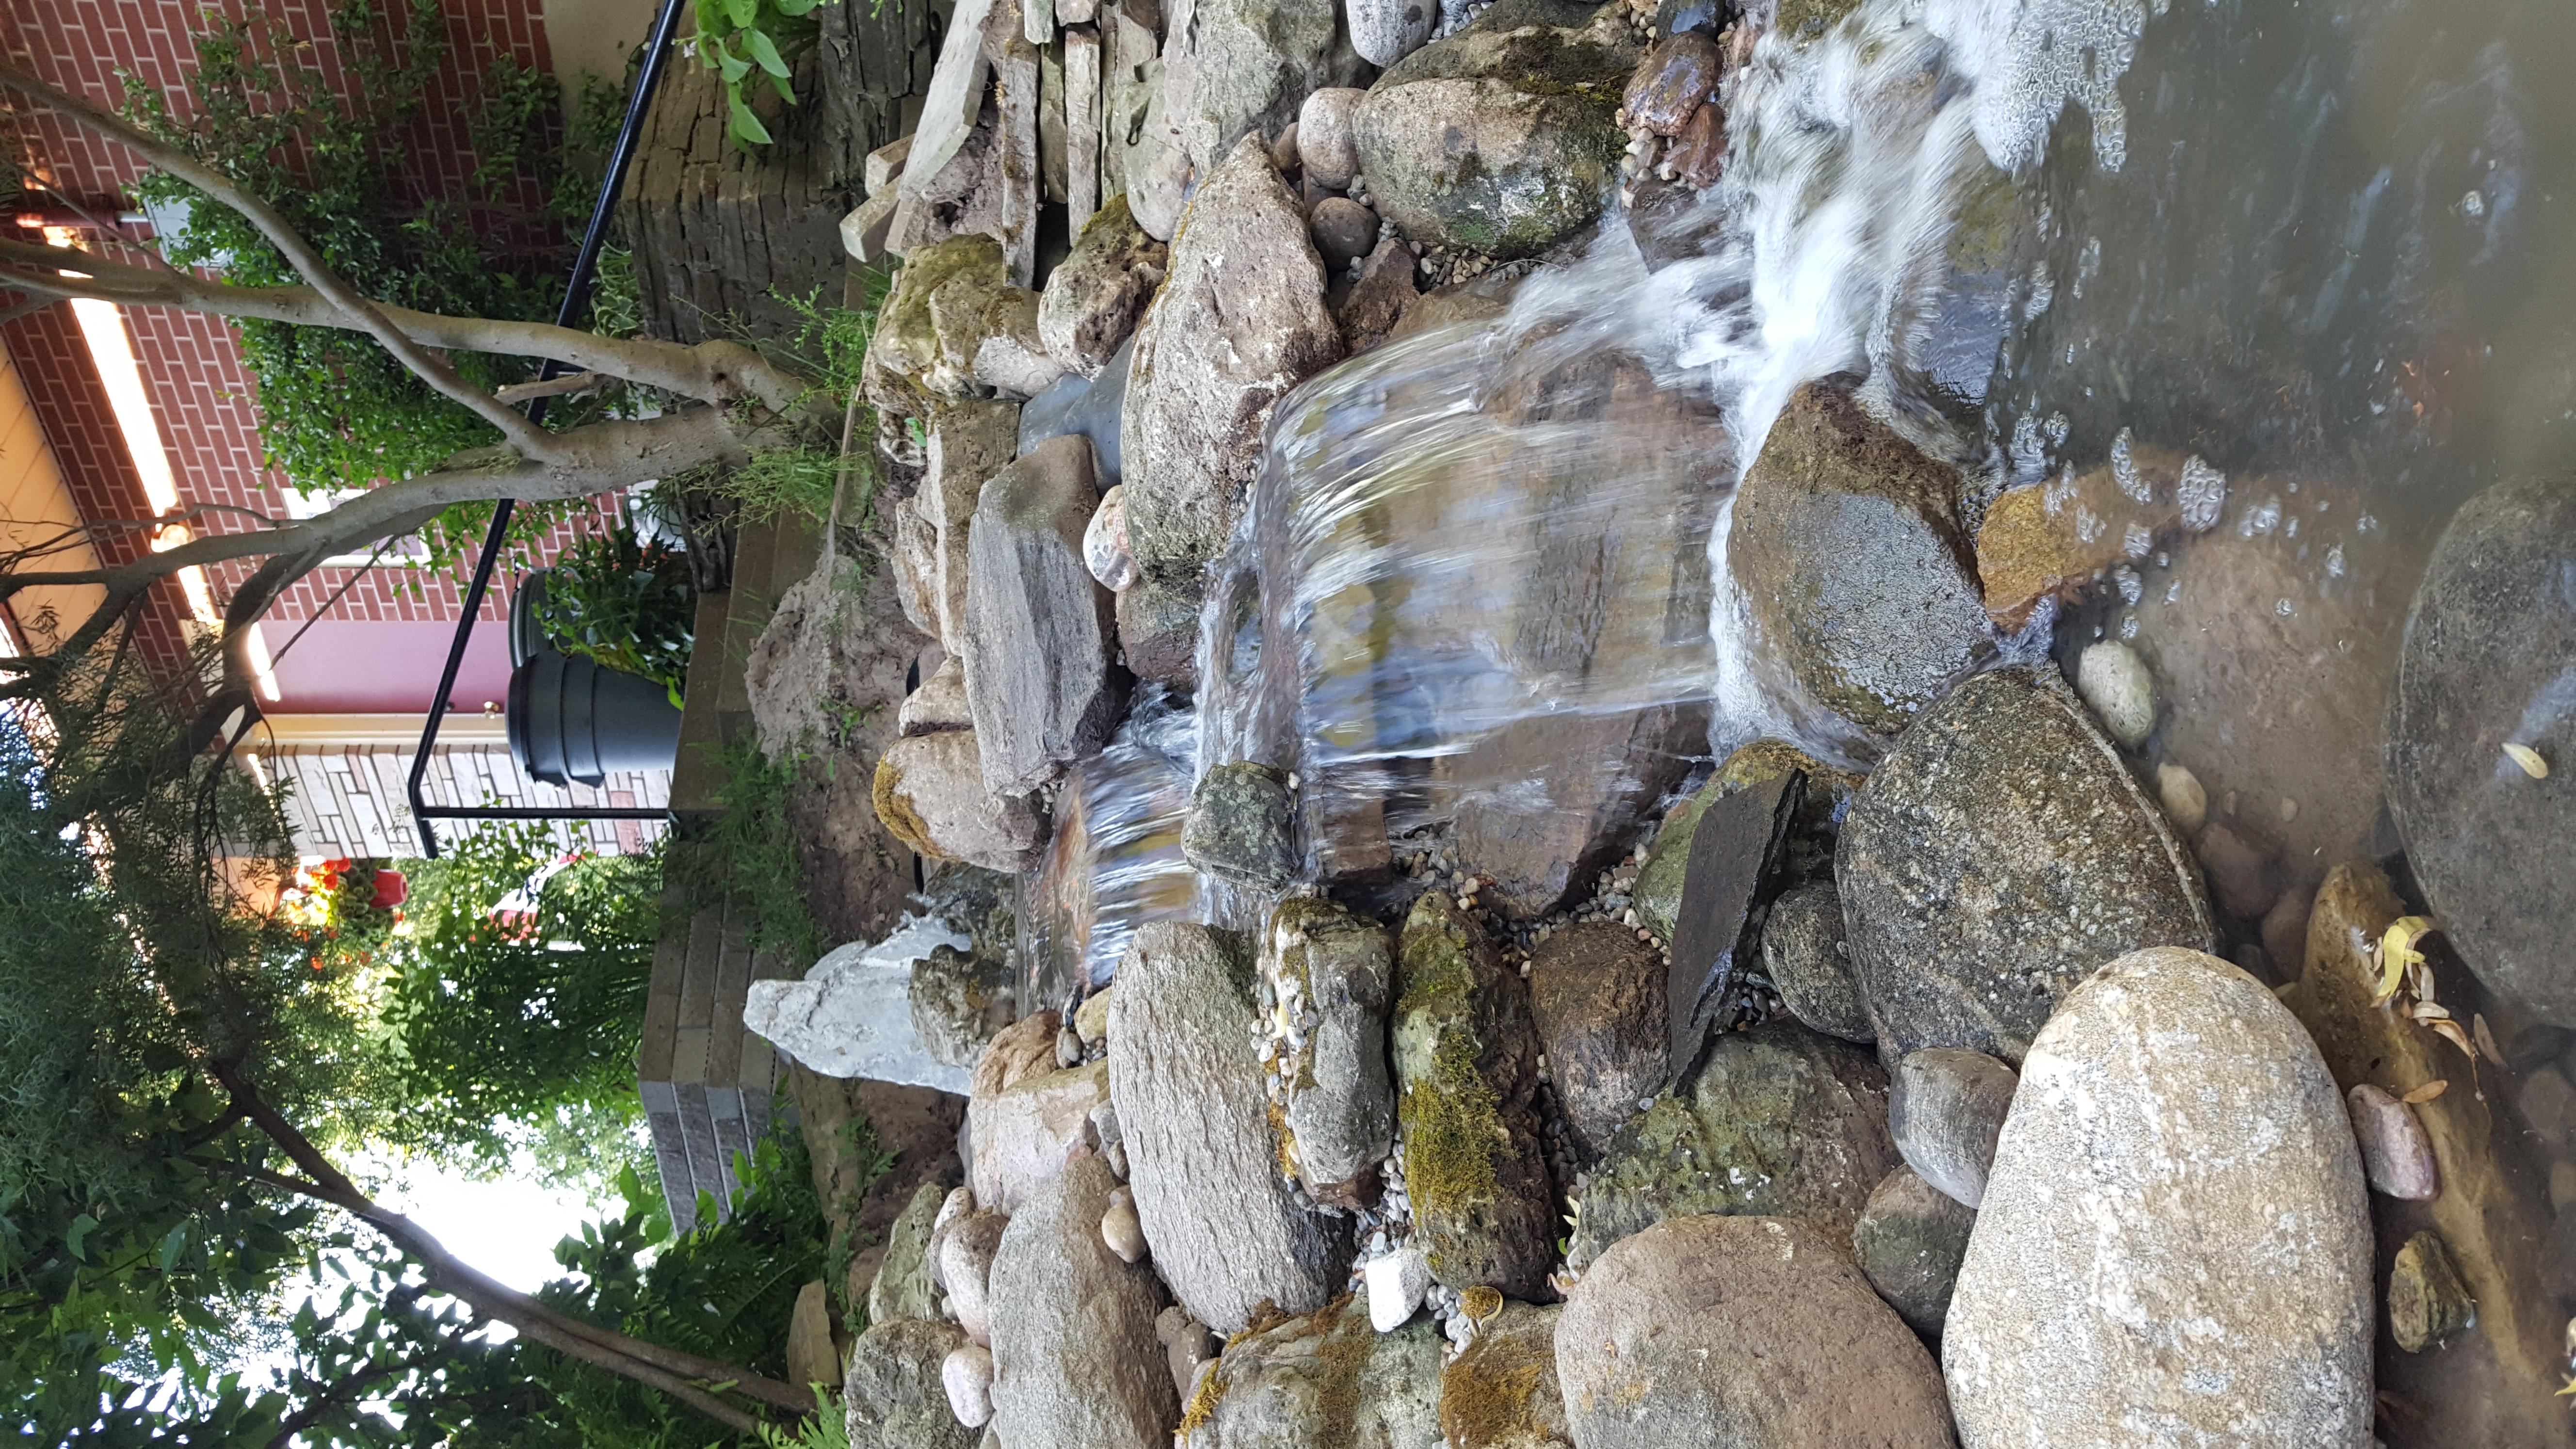 Jeffs Waterfall